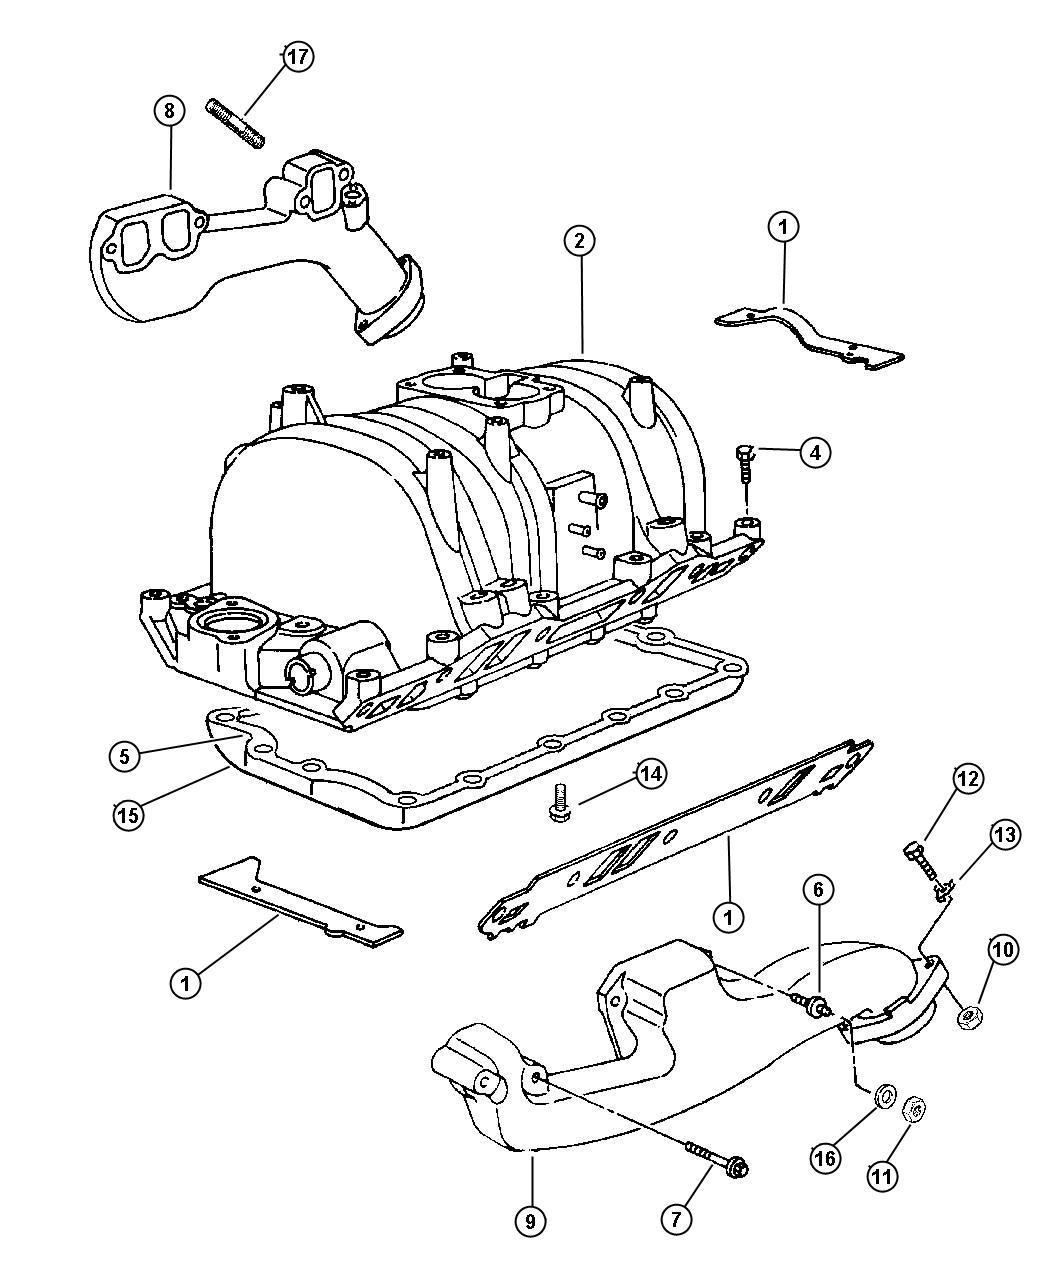 Dodge Dakota Magnum 3 9l Smpi V6 5 Speed Hd Manual